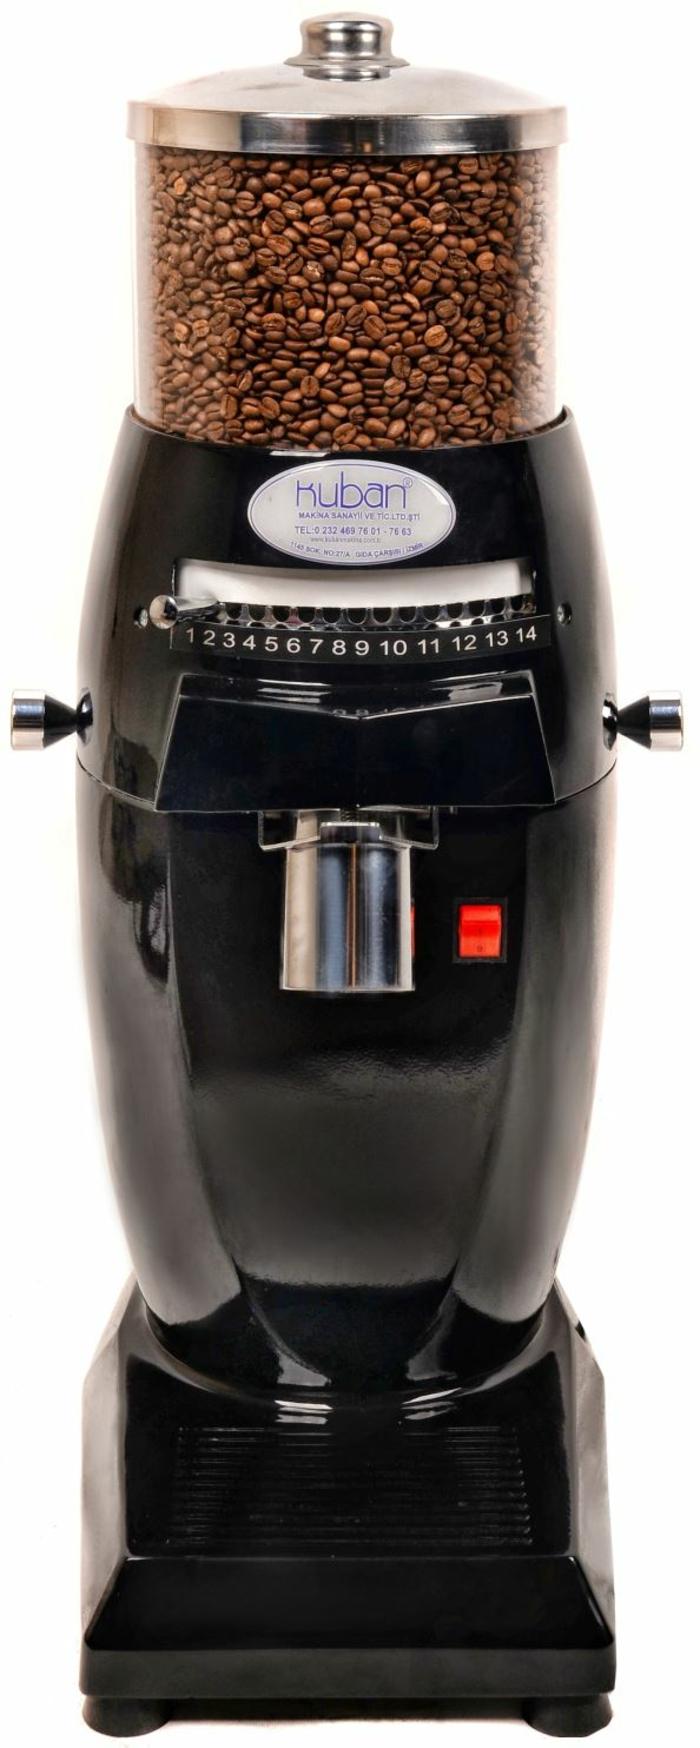 Kaffee mühle kaffemaschine